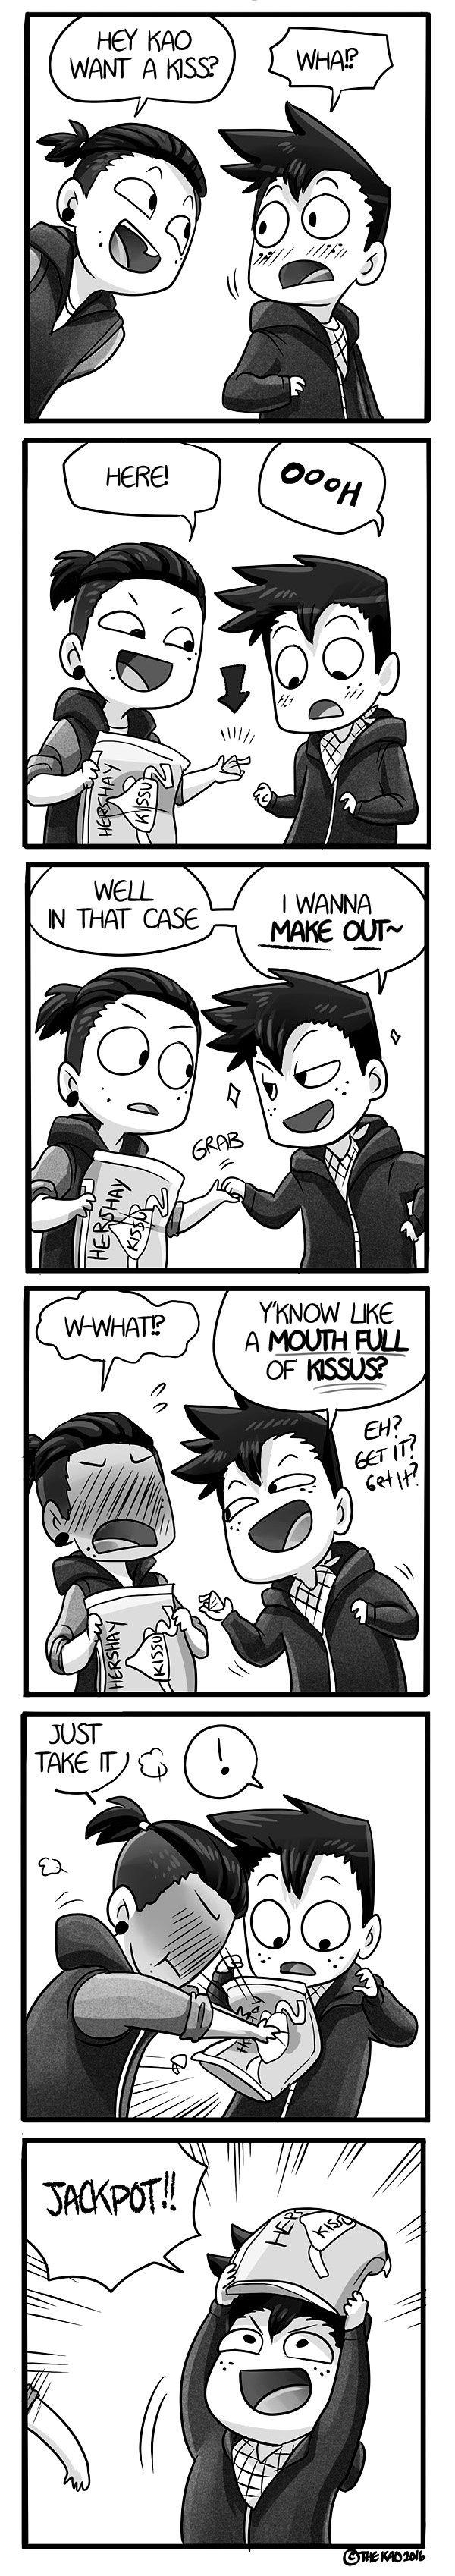 Mondo Mango :: Kiss (Ft. CK) | Tapastic Comics - image 1